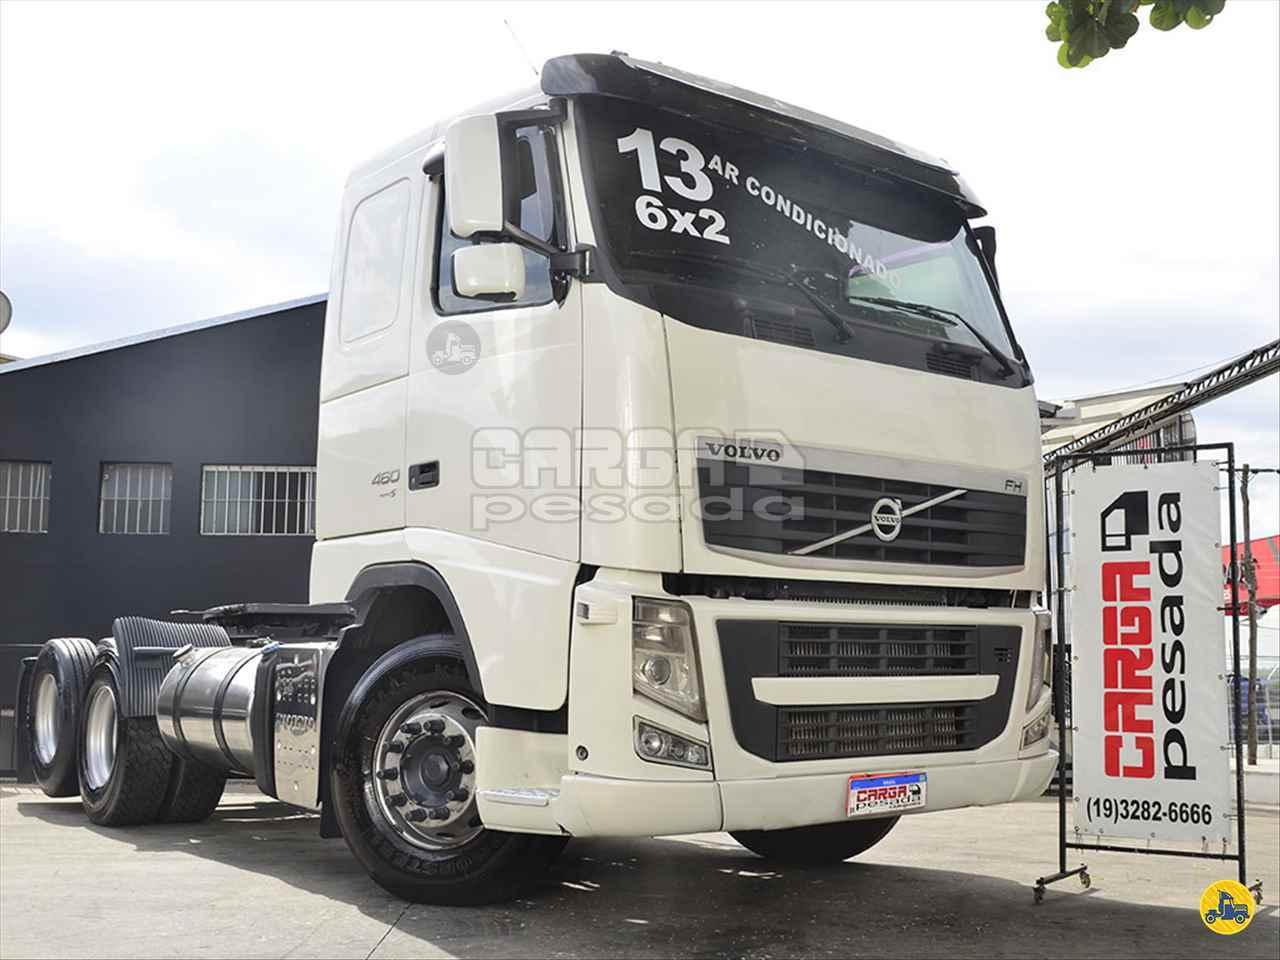 CAMINHAO VOLVO VOLVO FH 460 Cavalo Mecânico Truck 6x2 Carga Pesada Caminhões SAO PAULO SÃO PAULO SP